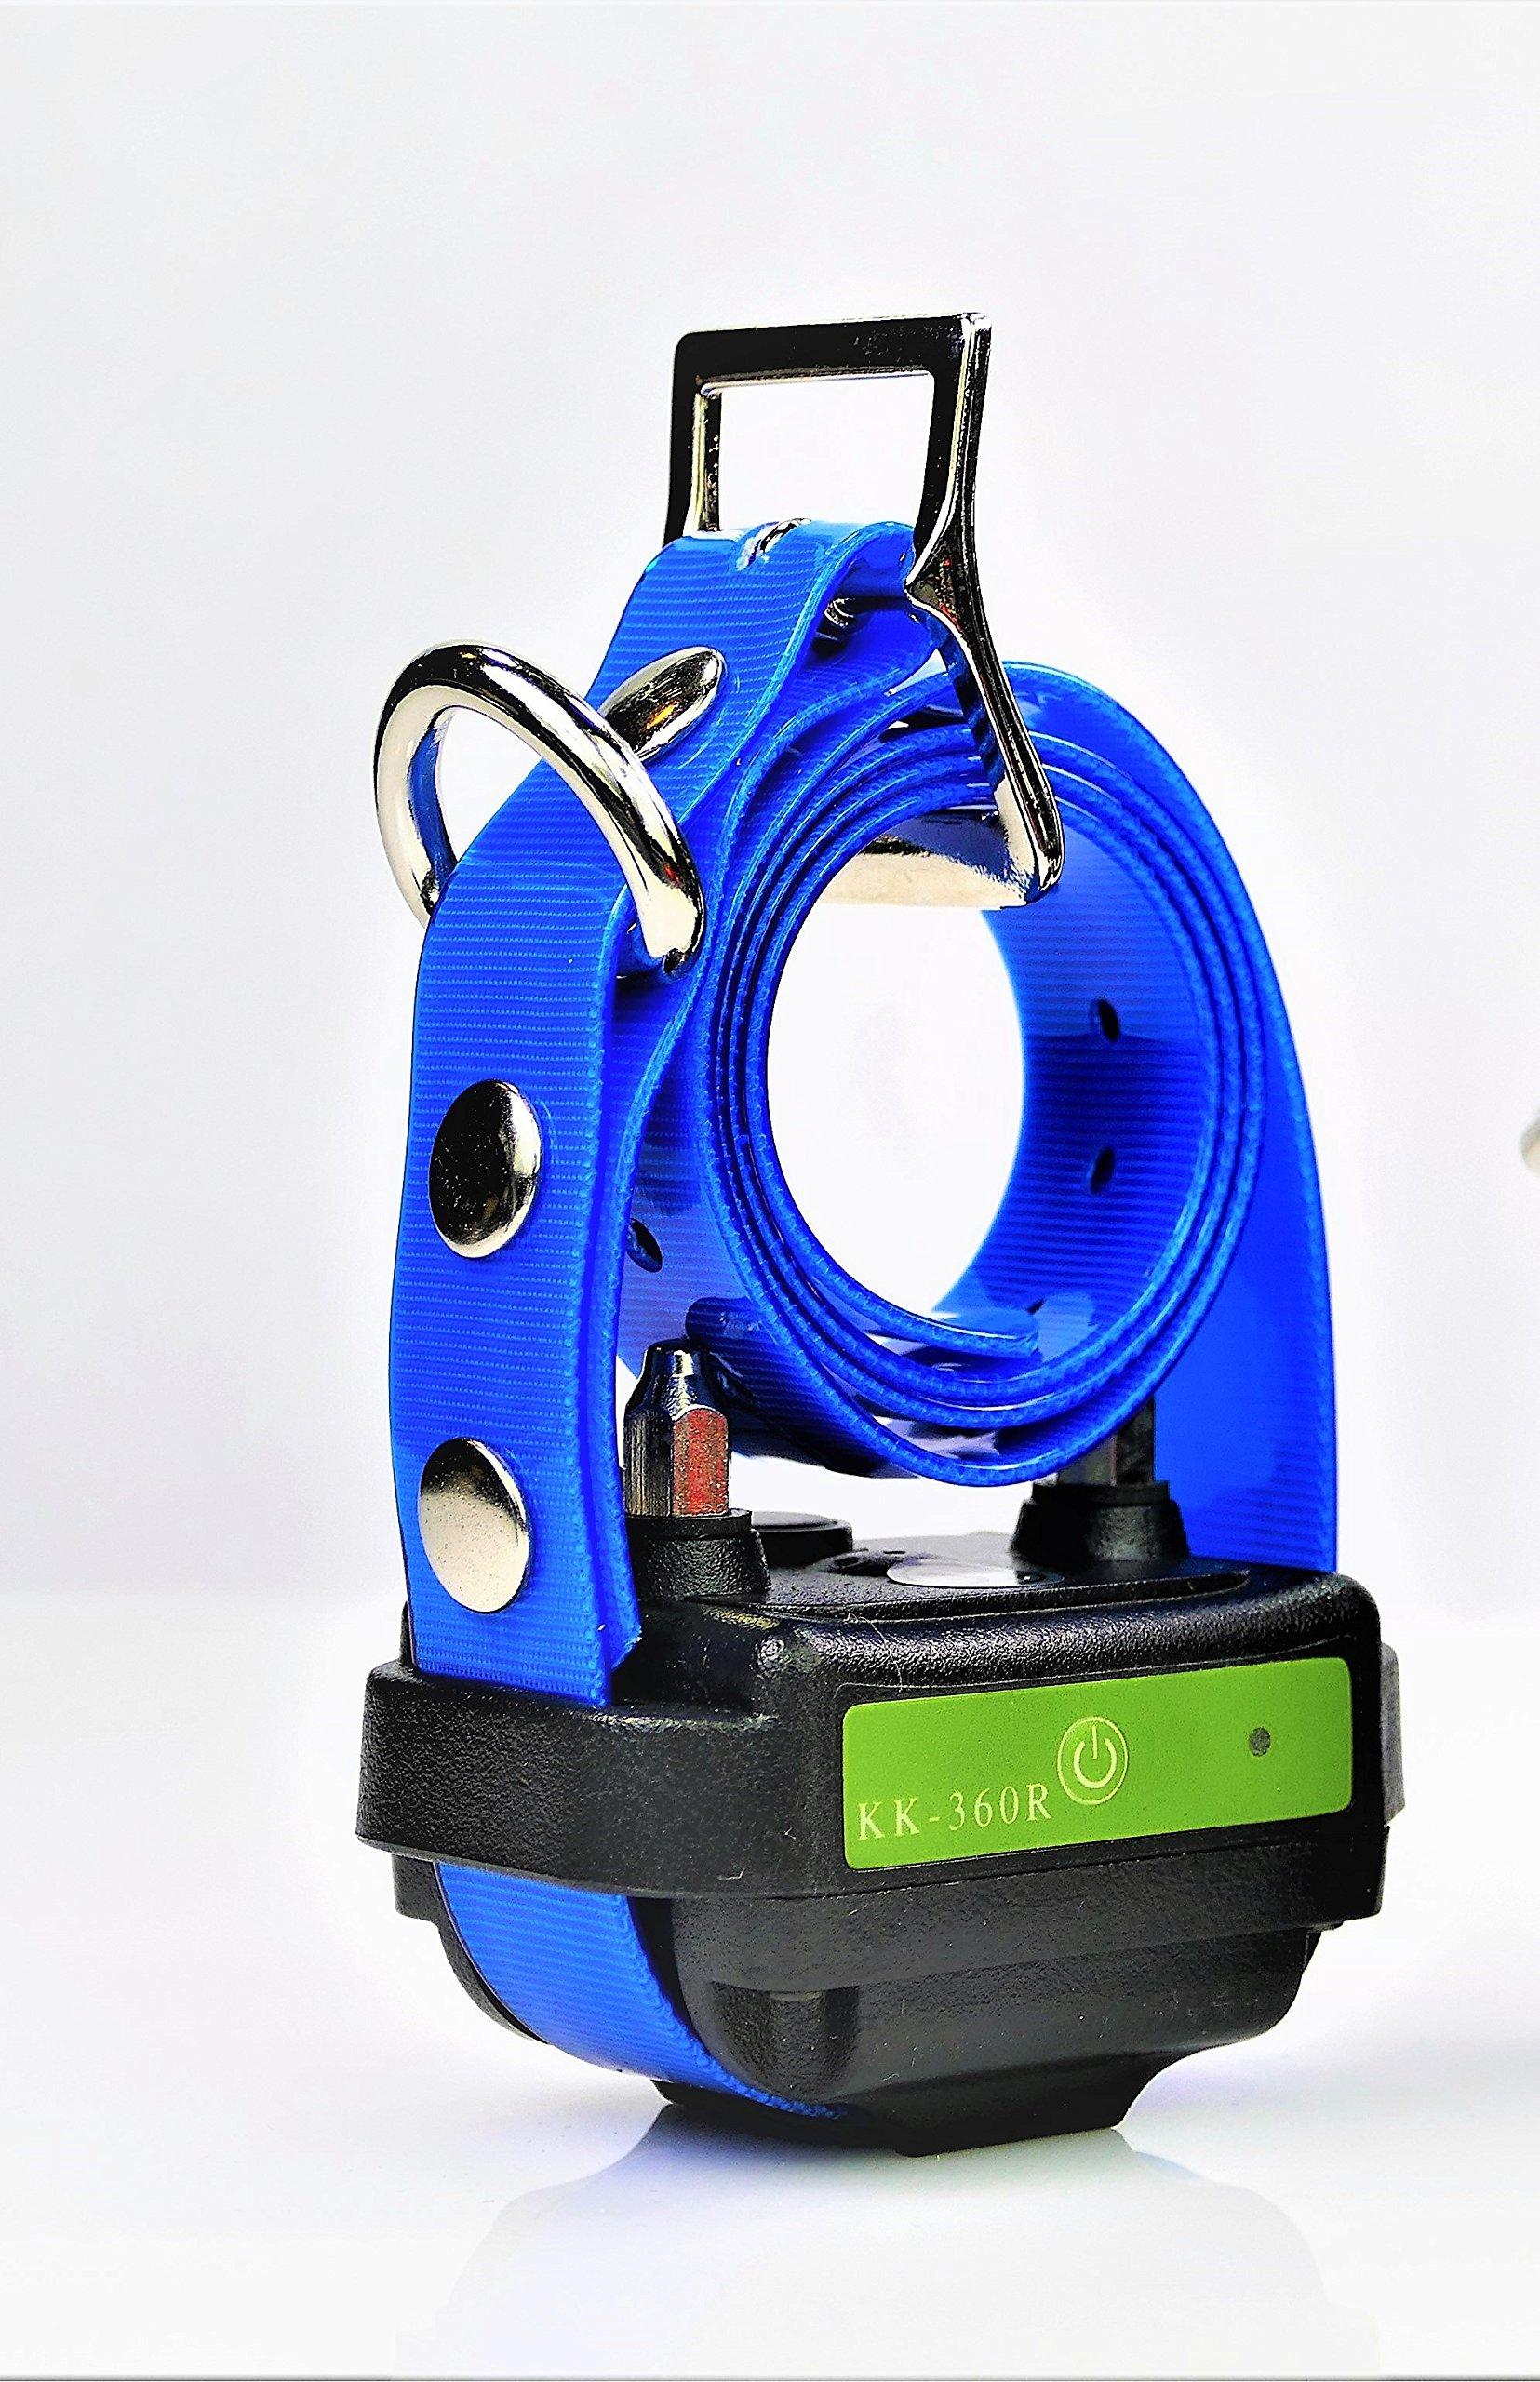 KoolKani Replacement/Spare Collar KK-360 Remote Dog Training Shock Collar System by KoolKani